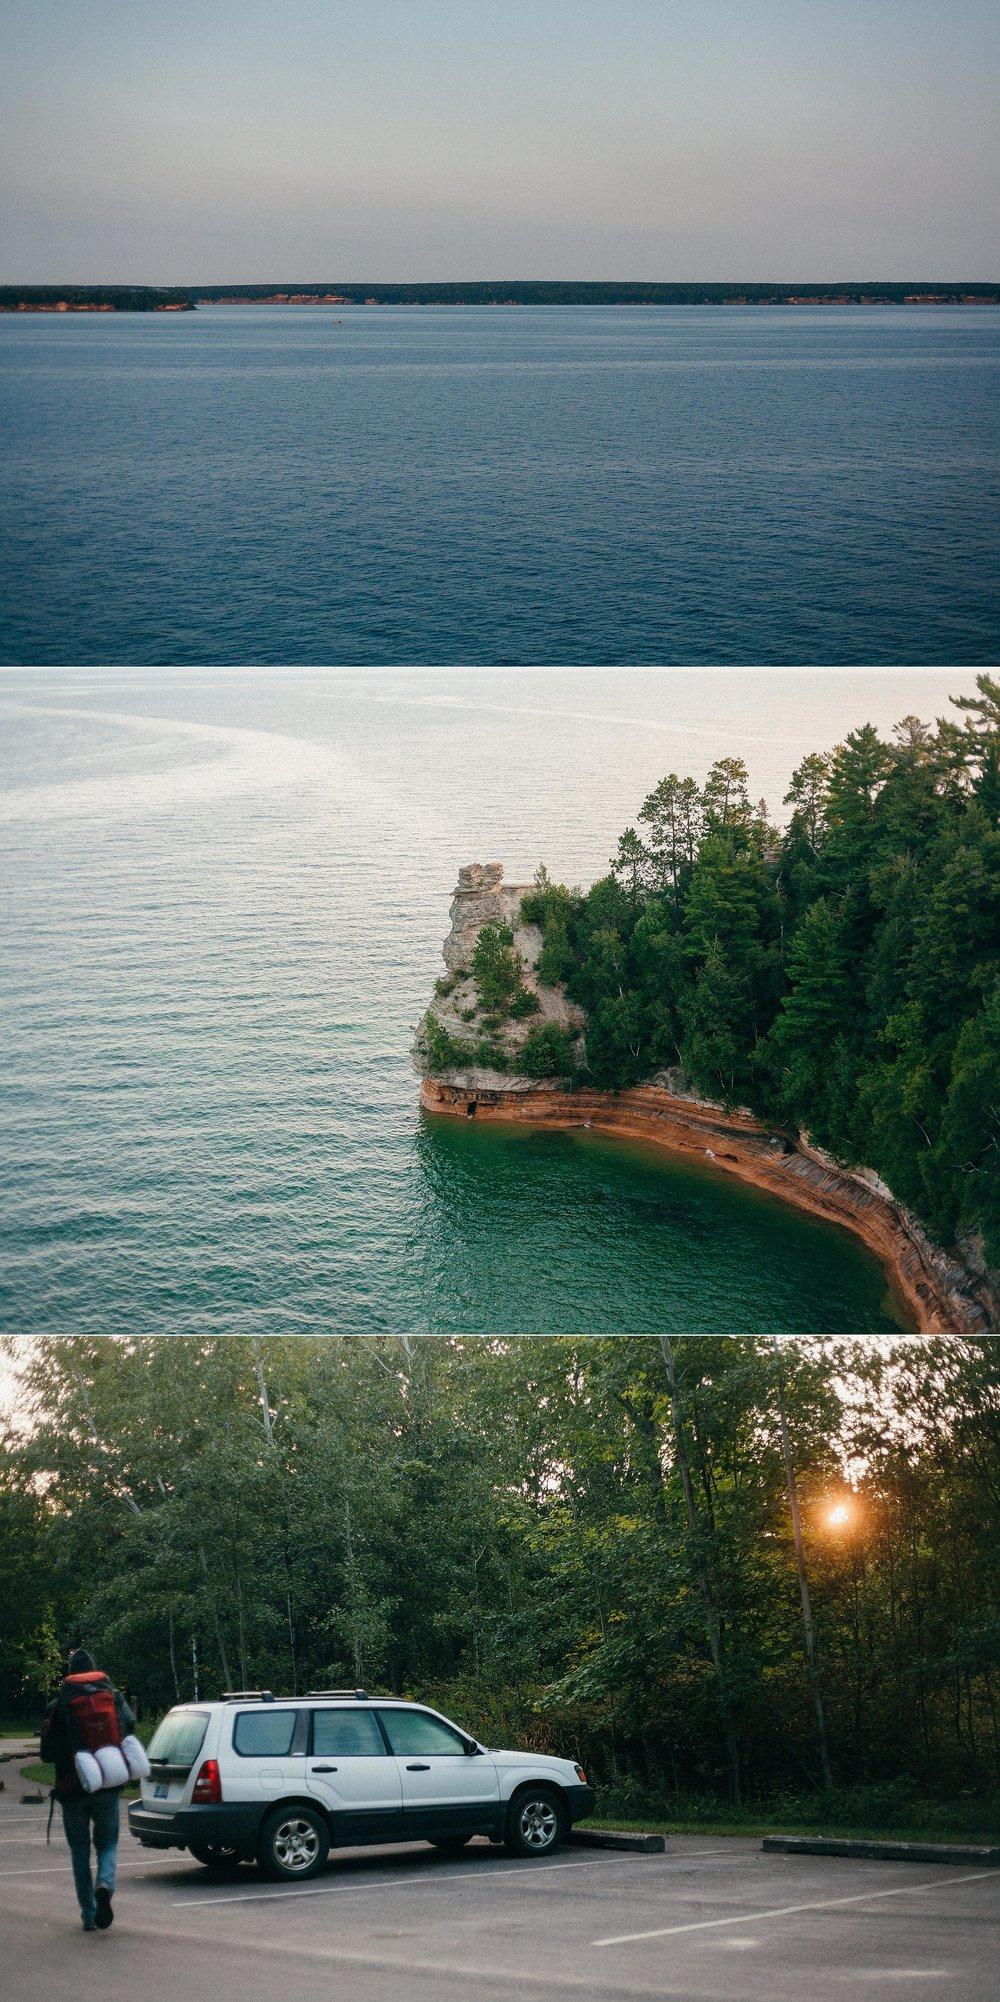 backpacking-michigan-upper-peninsula-pictured-rocks-camping-lake-superior_0088.jpg